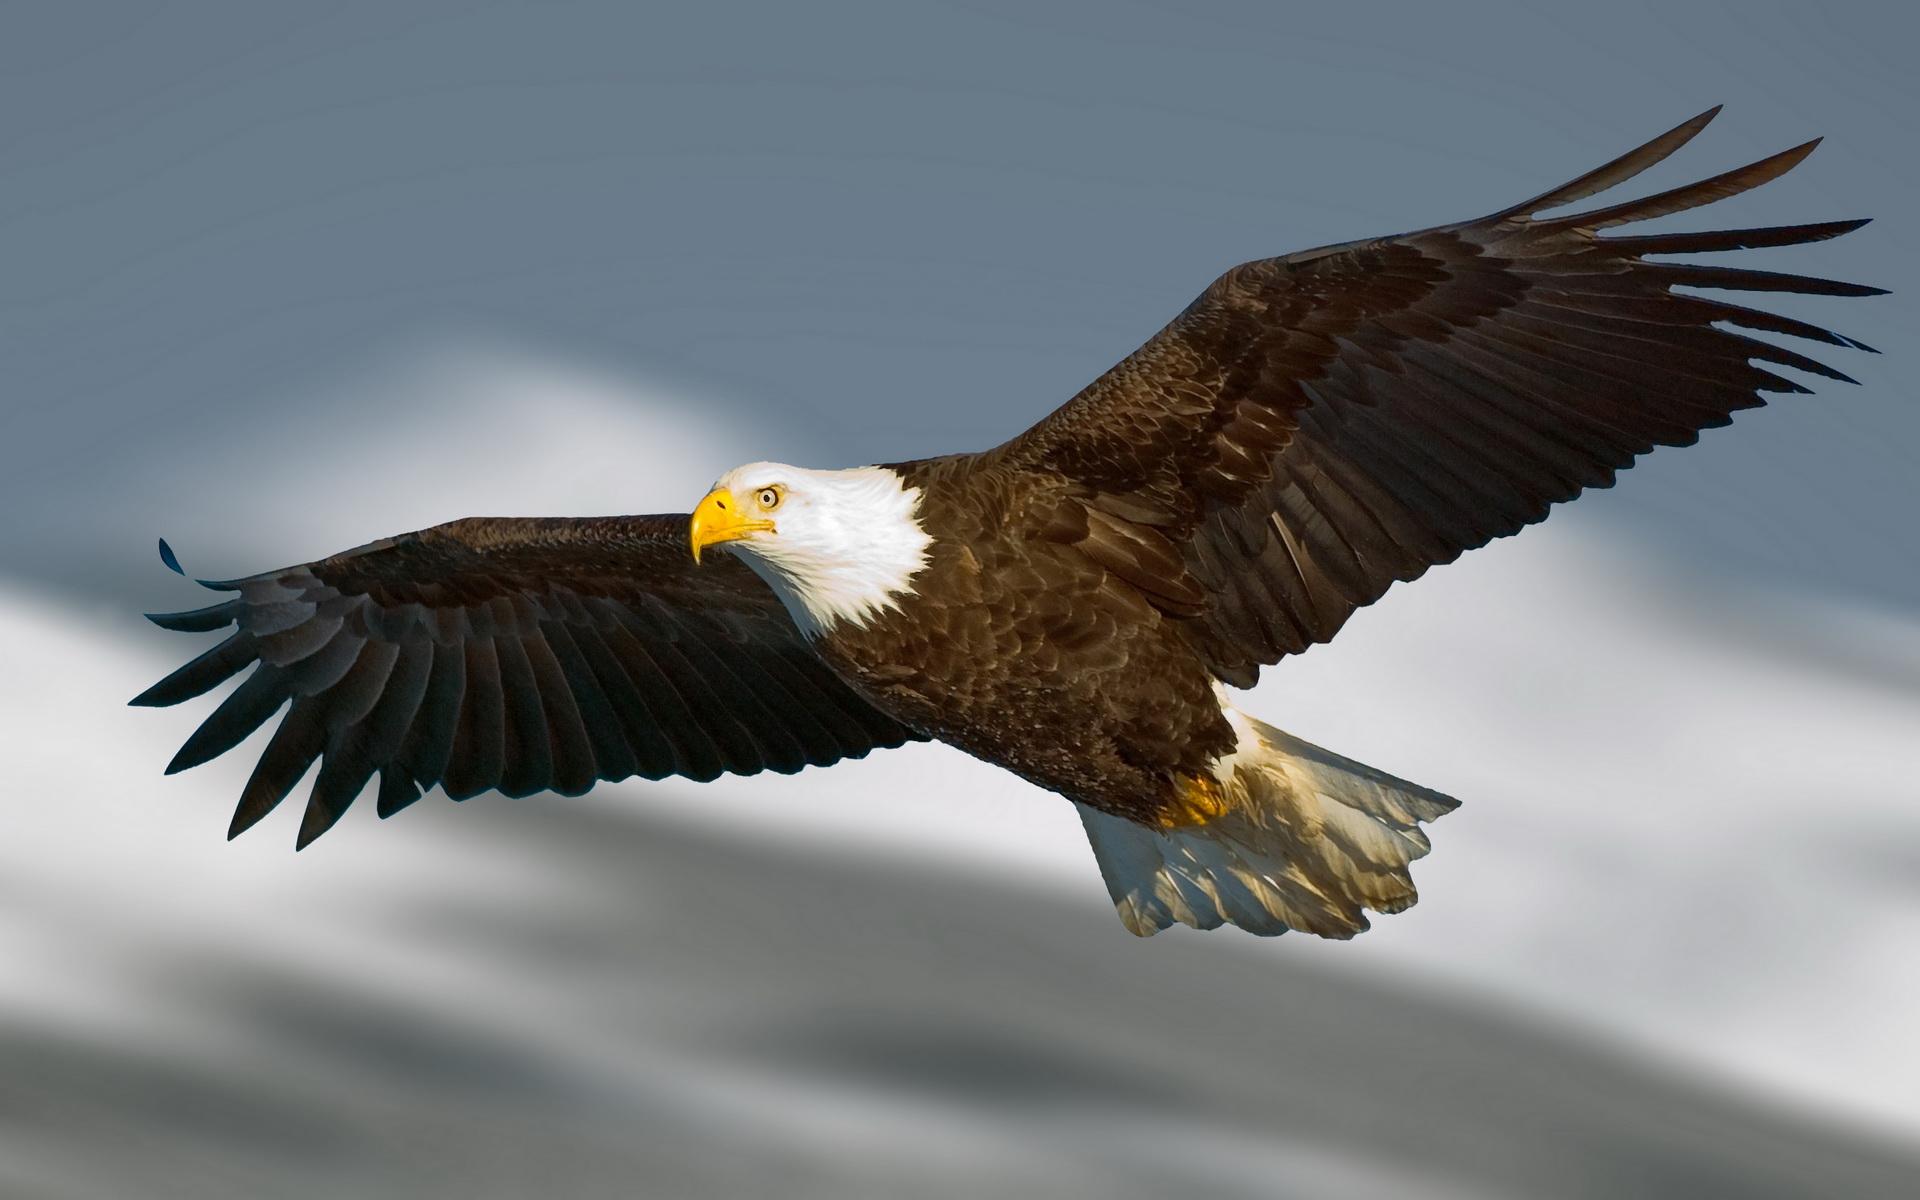 Eagle Wallpaper Px